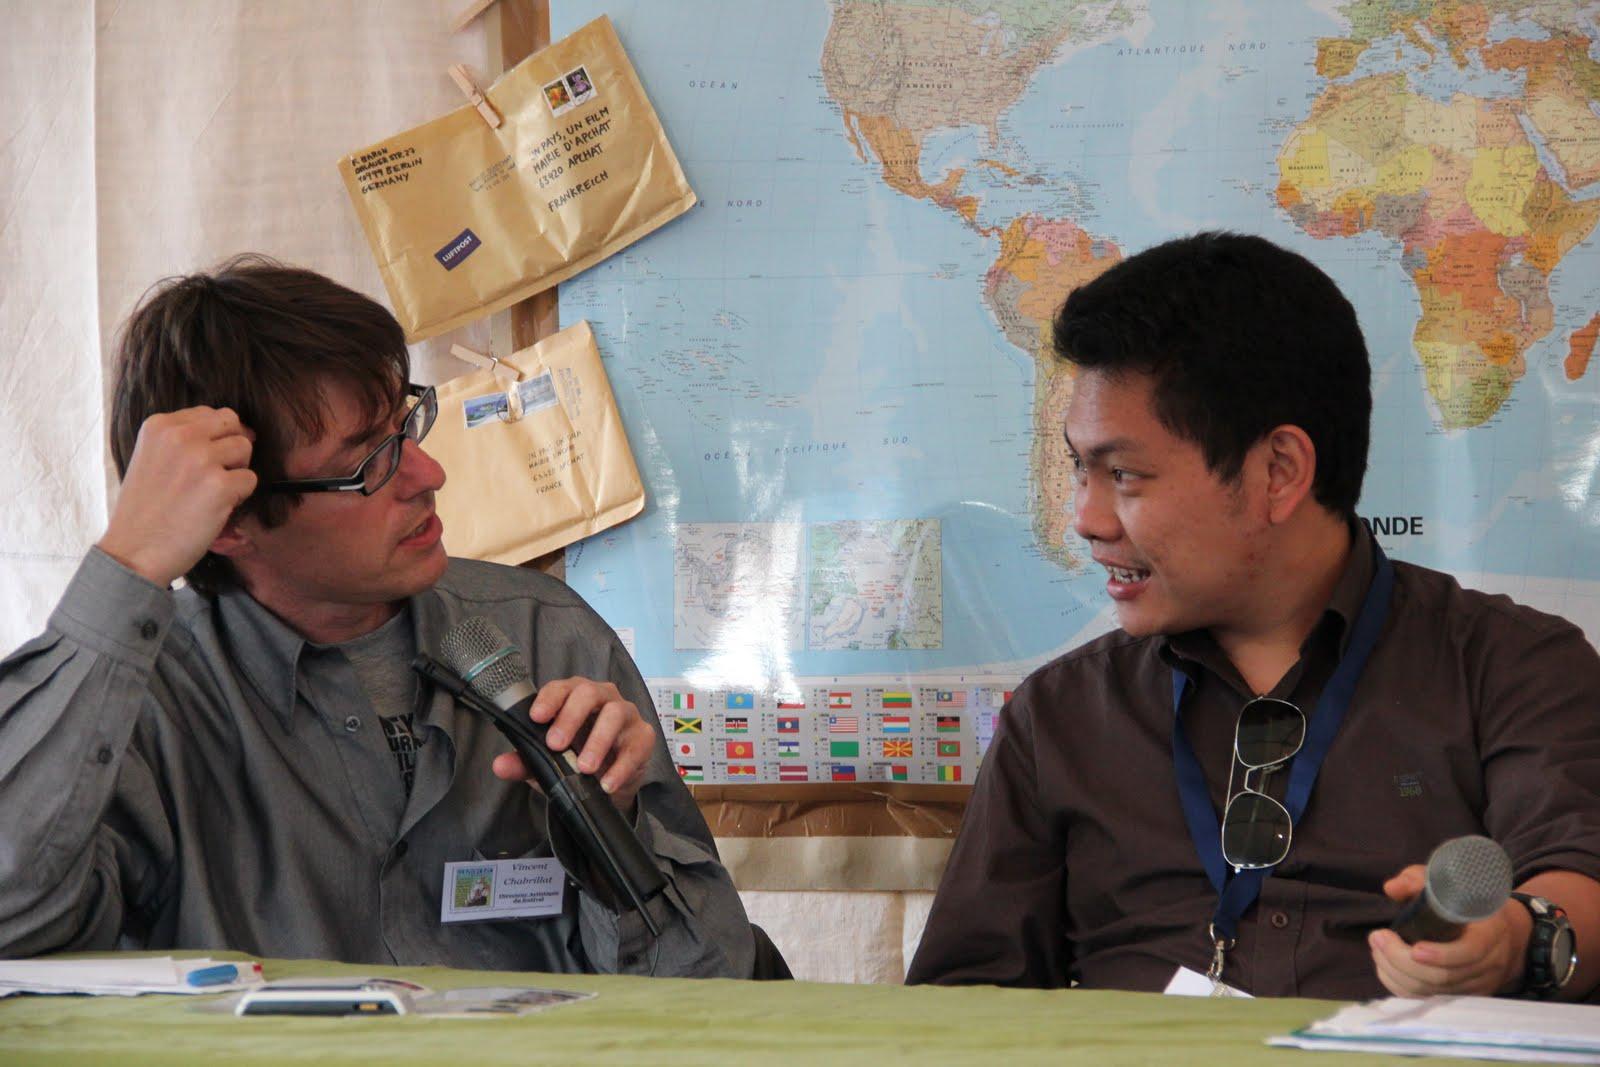 rencontre henri langlois 2011